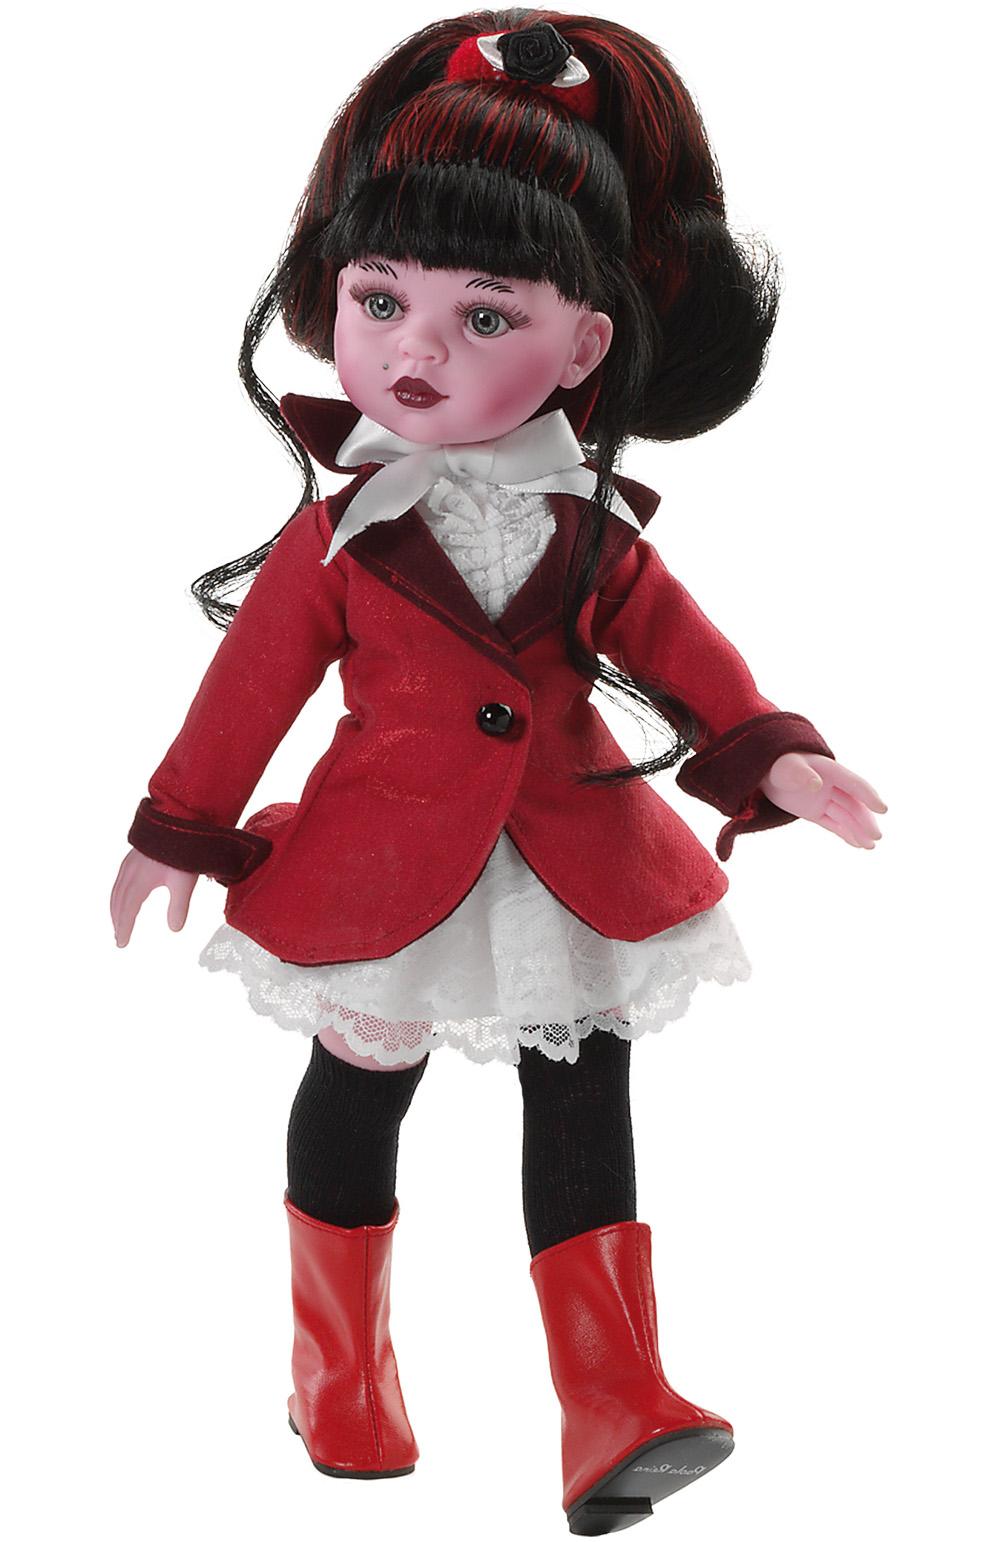 Realistická panenka Monster roja (Doprava zdarma)